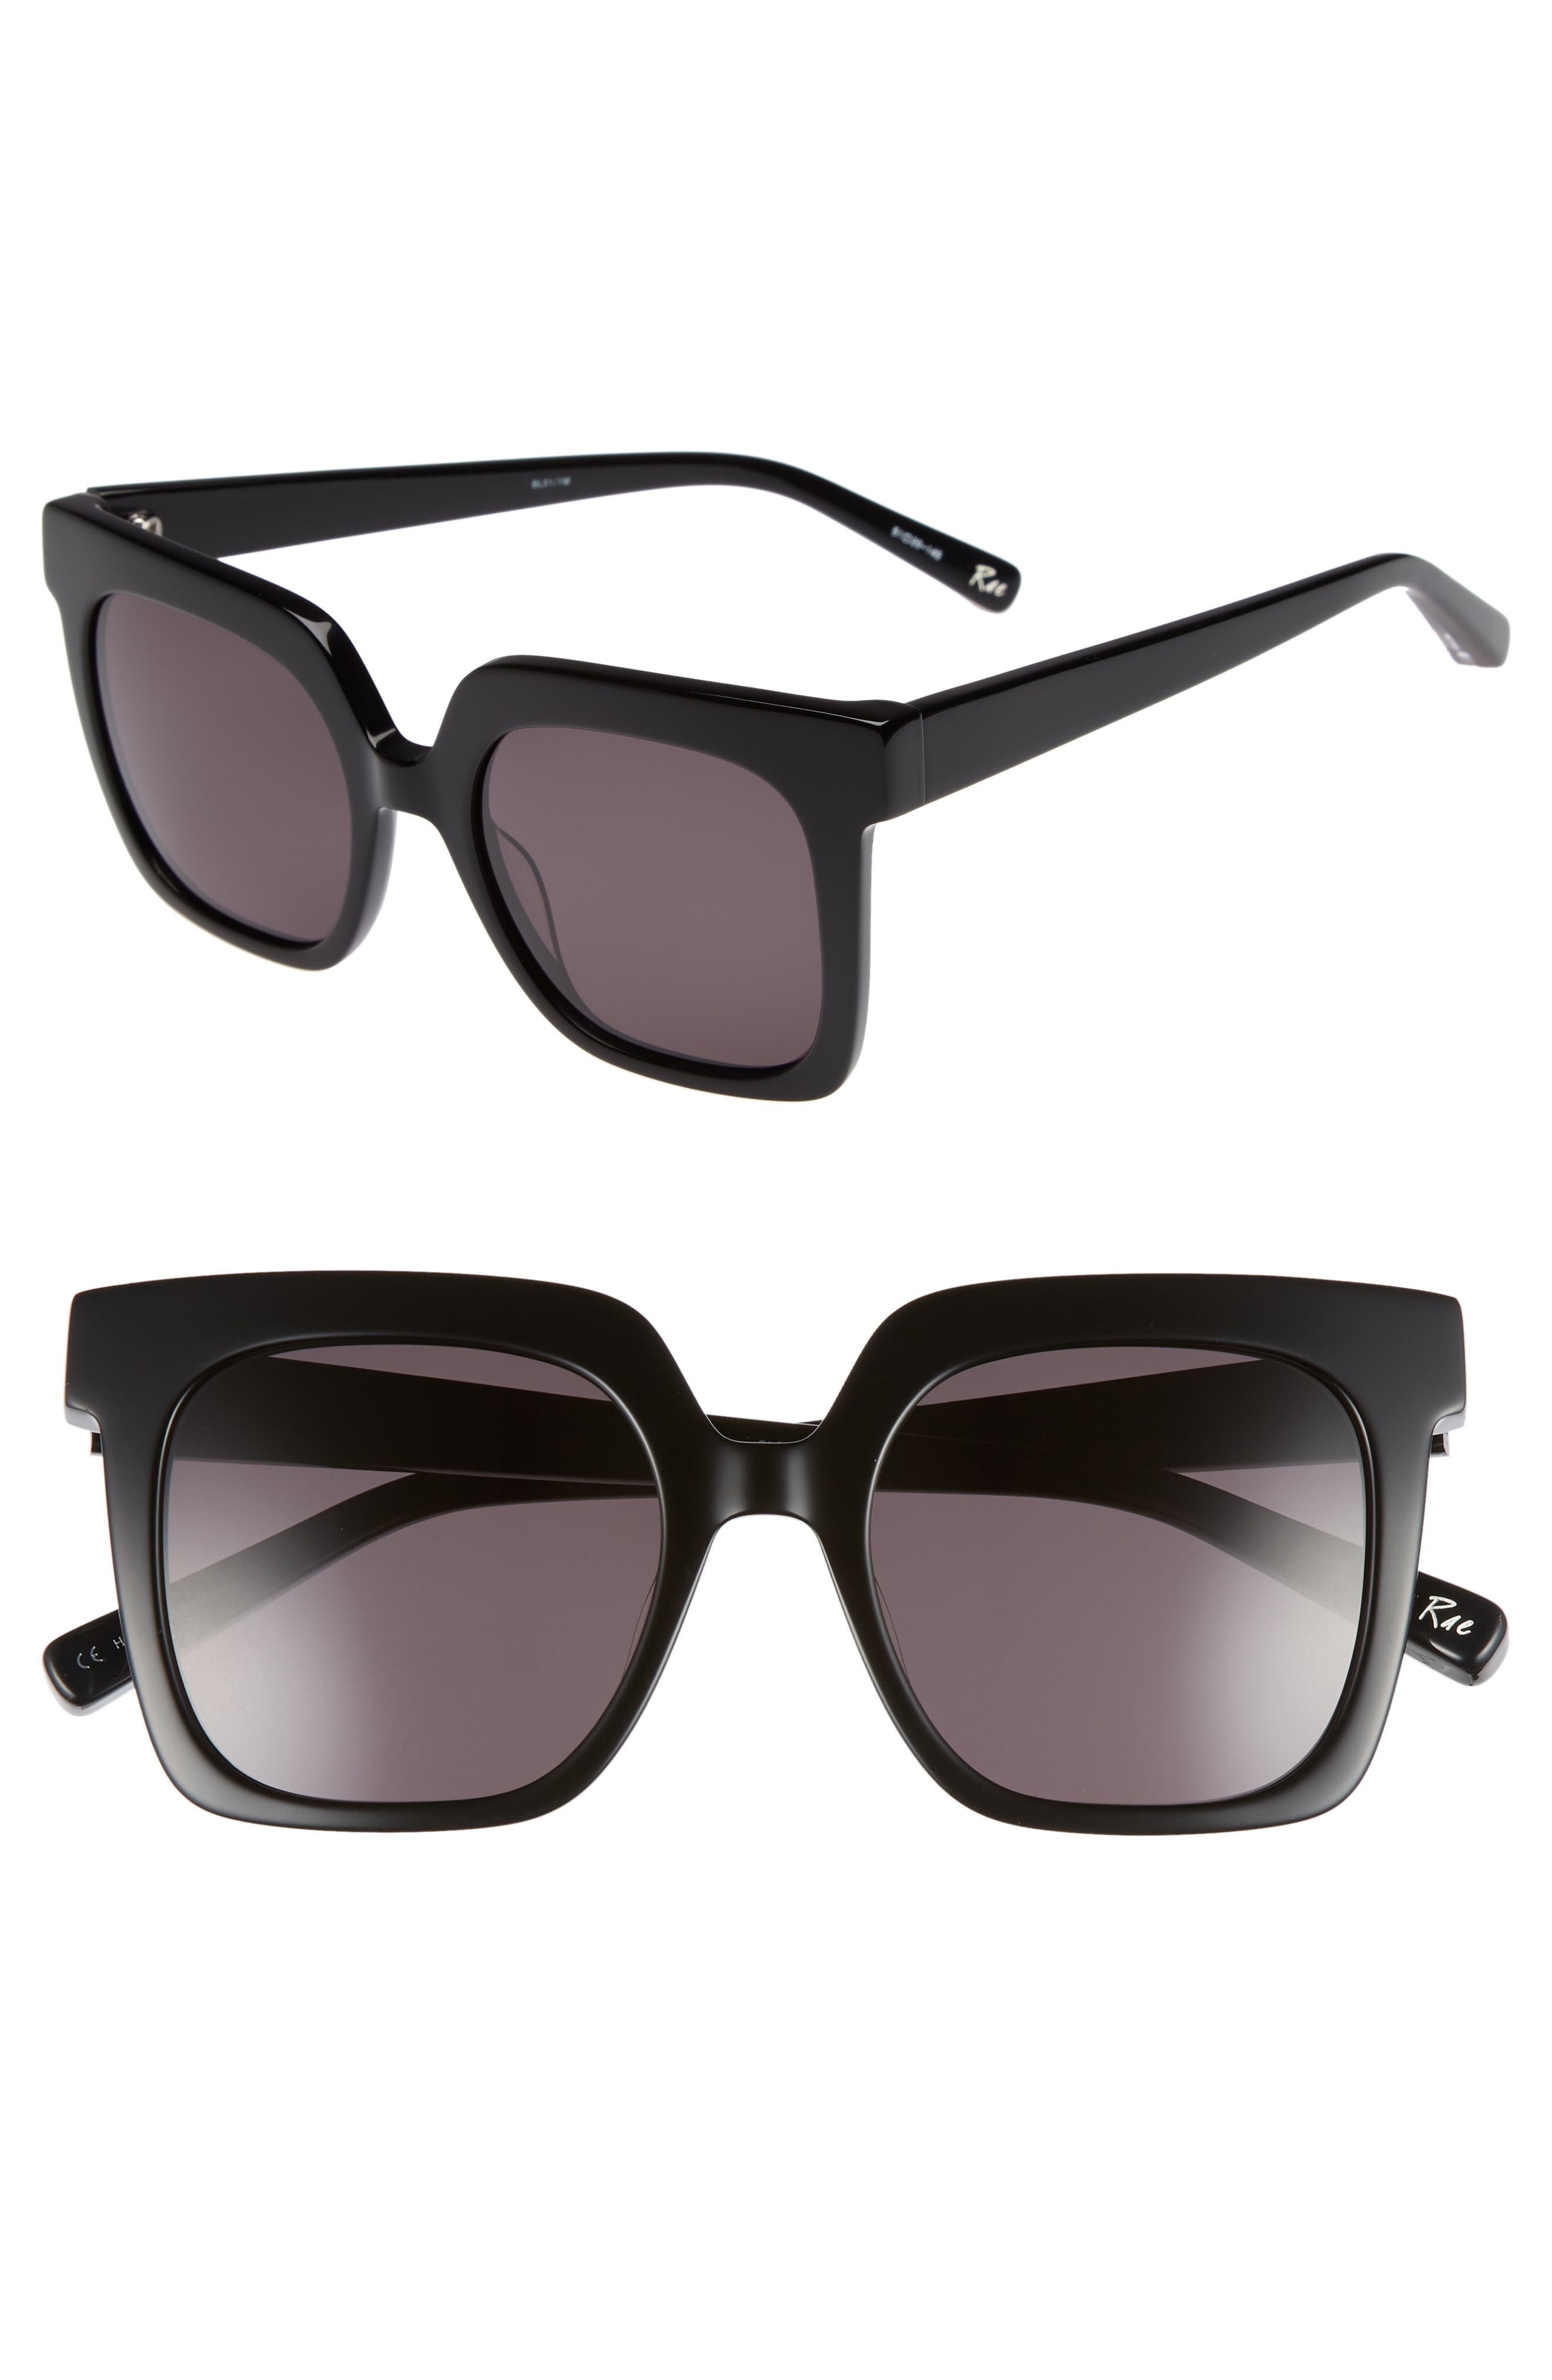 Rae 51mm Square Sunglasses,                             Main thumbnail 1, color,                             001